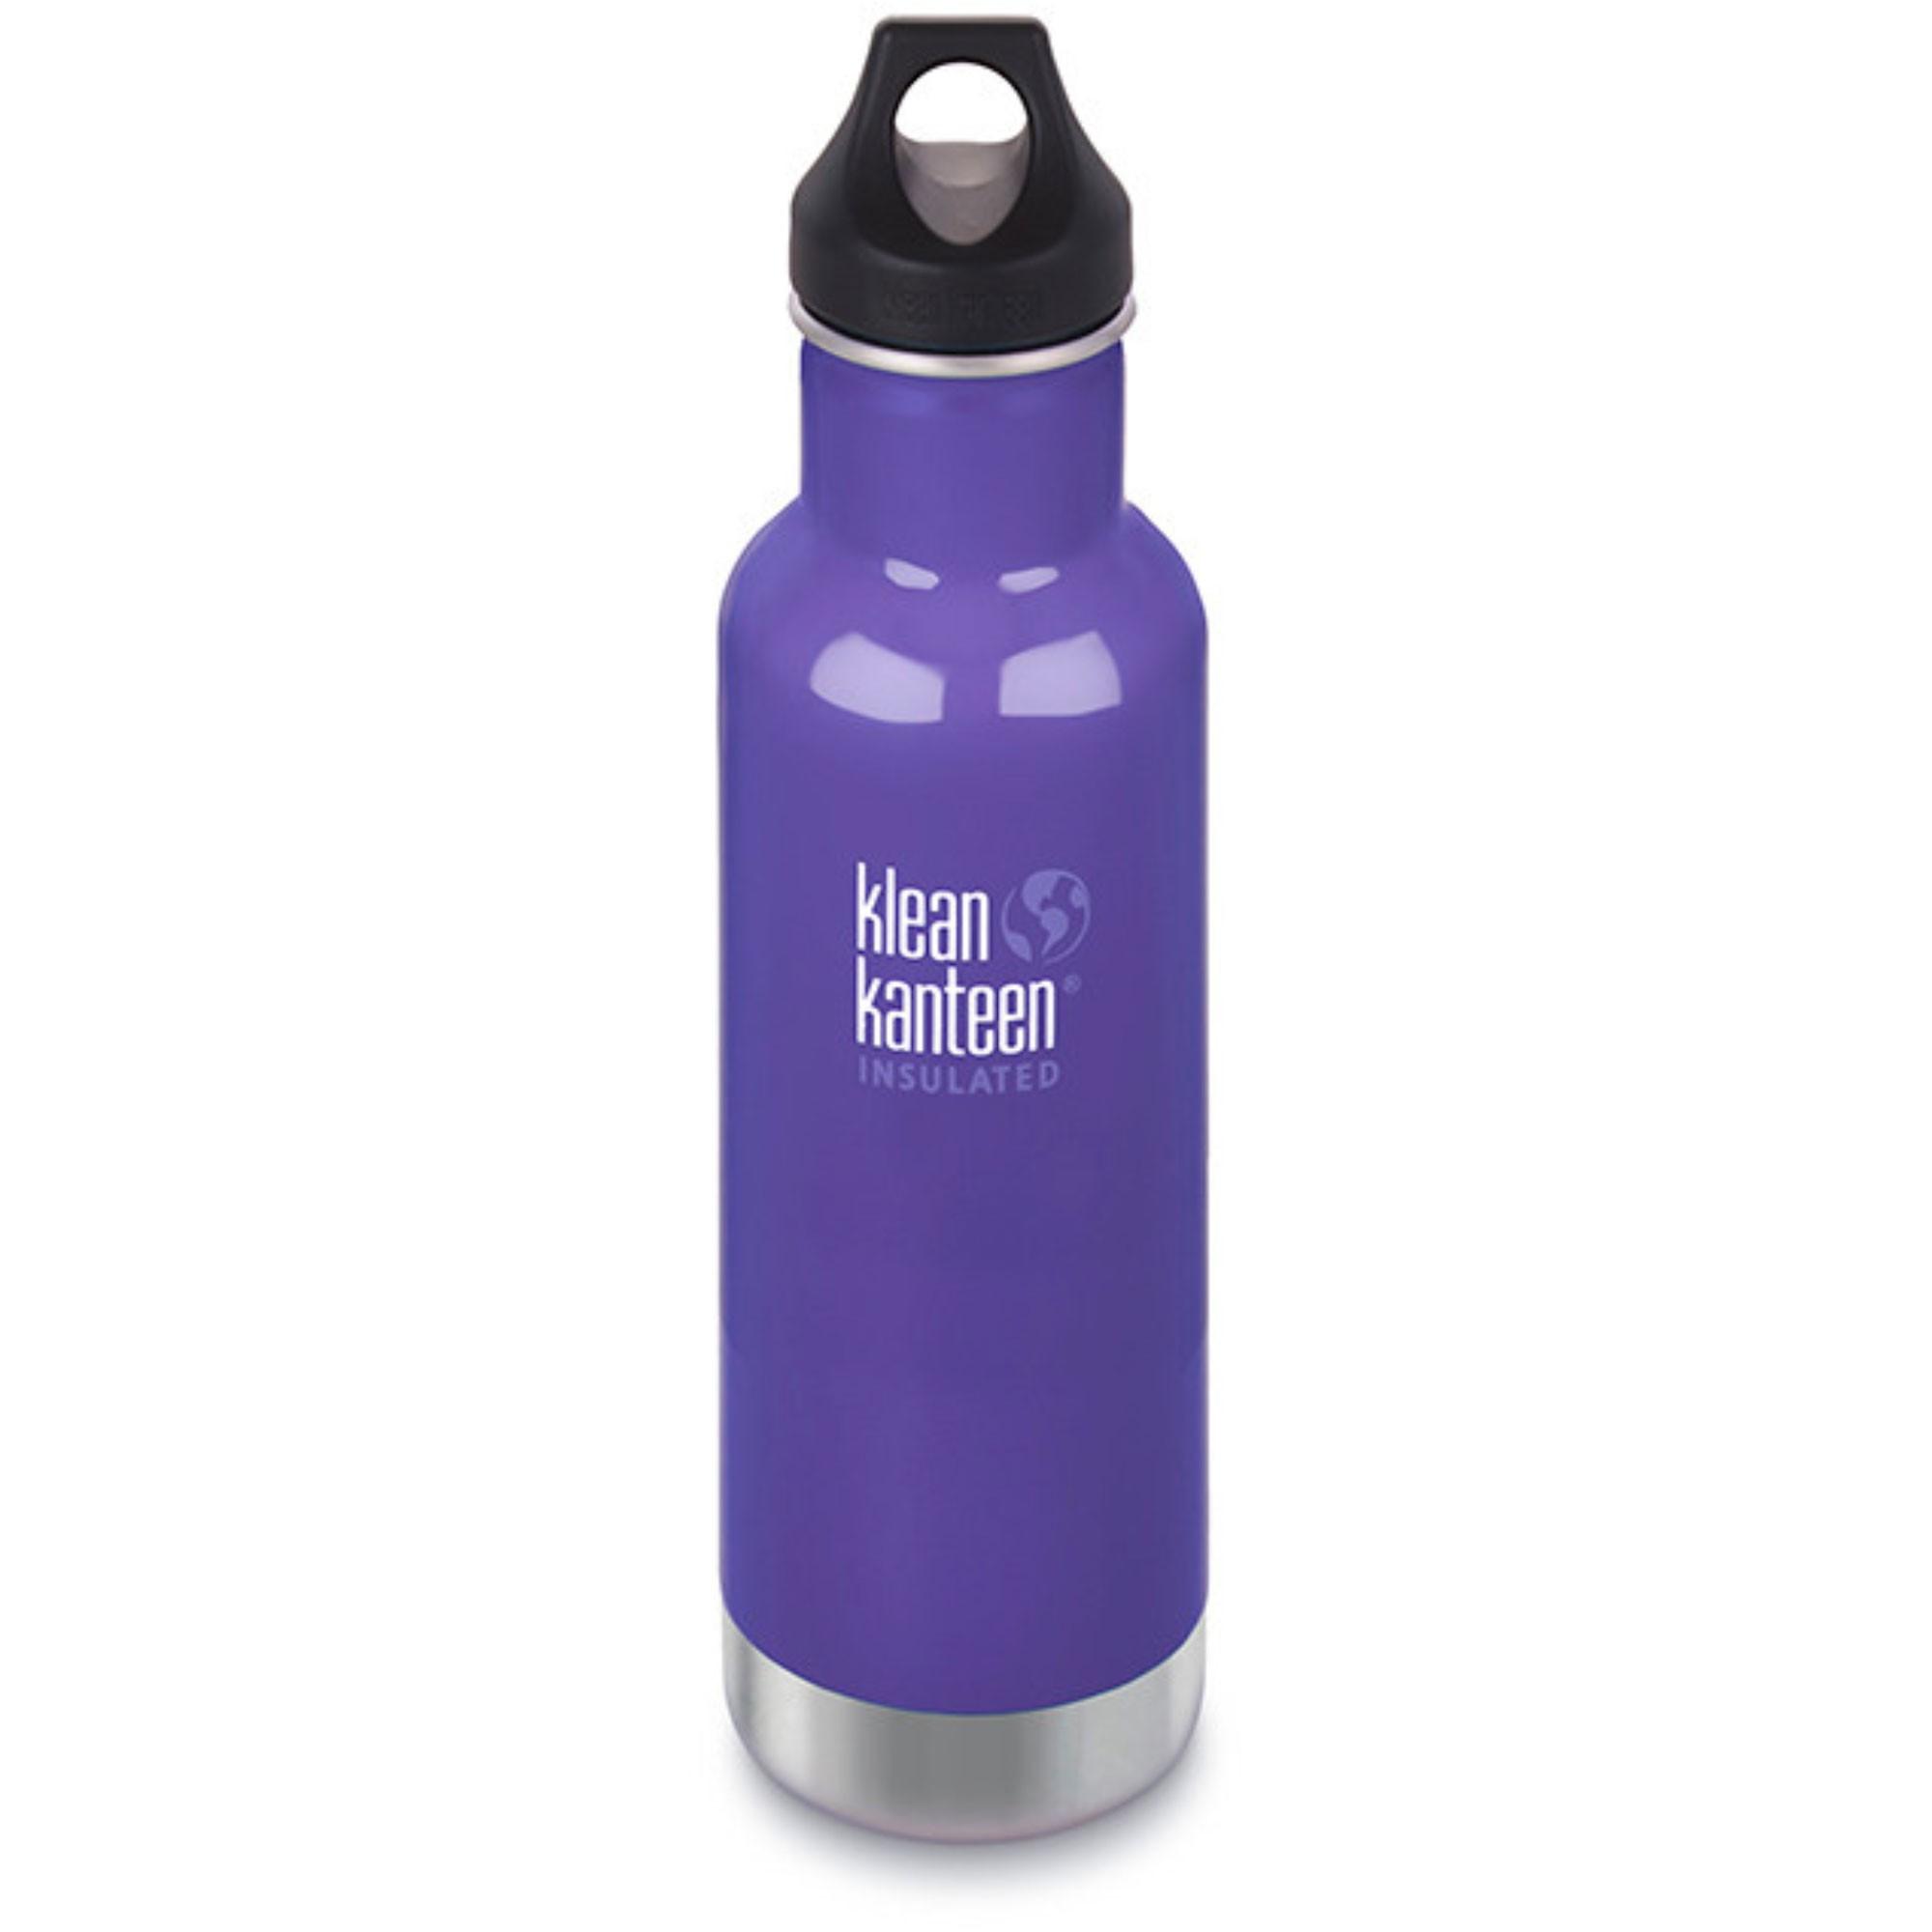 KLEAN KANTEEN - Classic Insulated Flask - 592ml - Blooming Iris